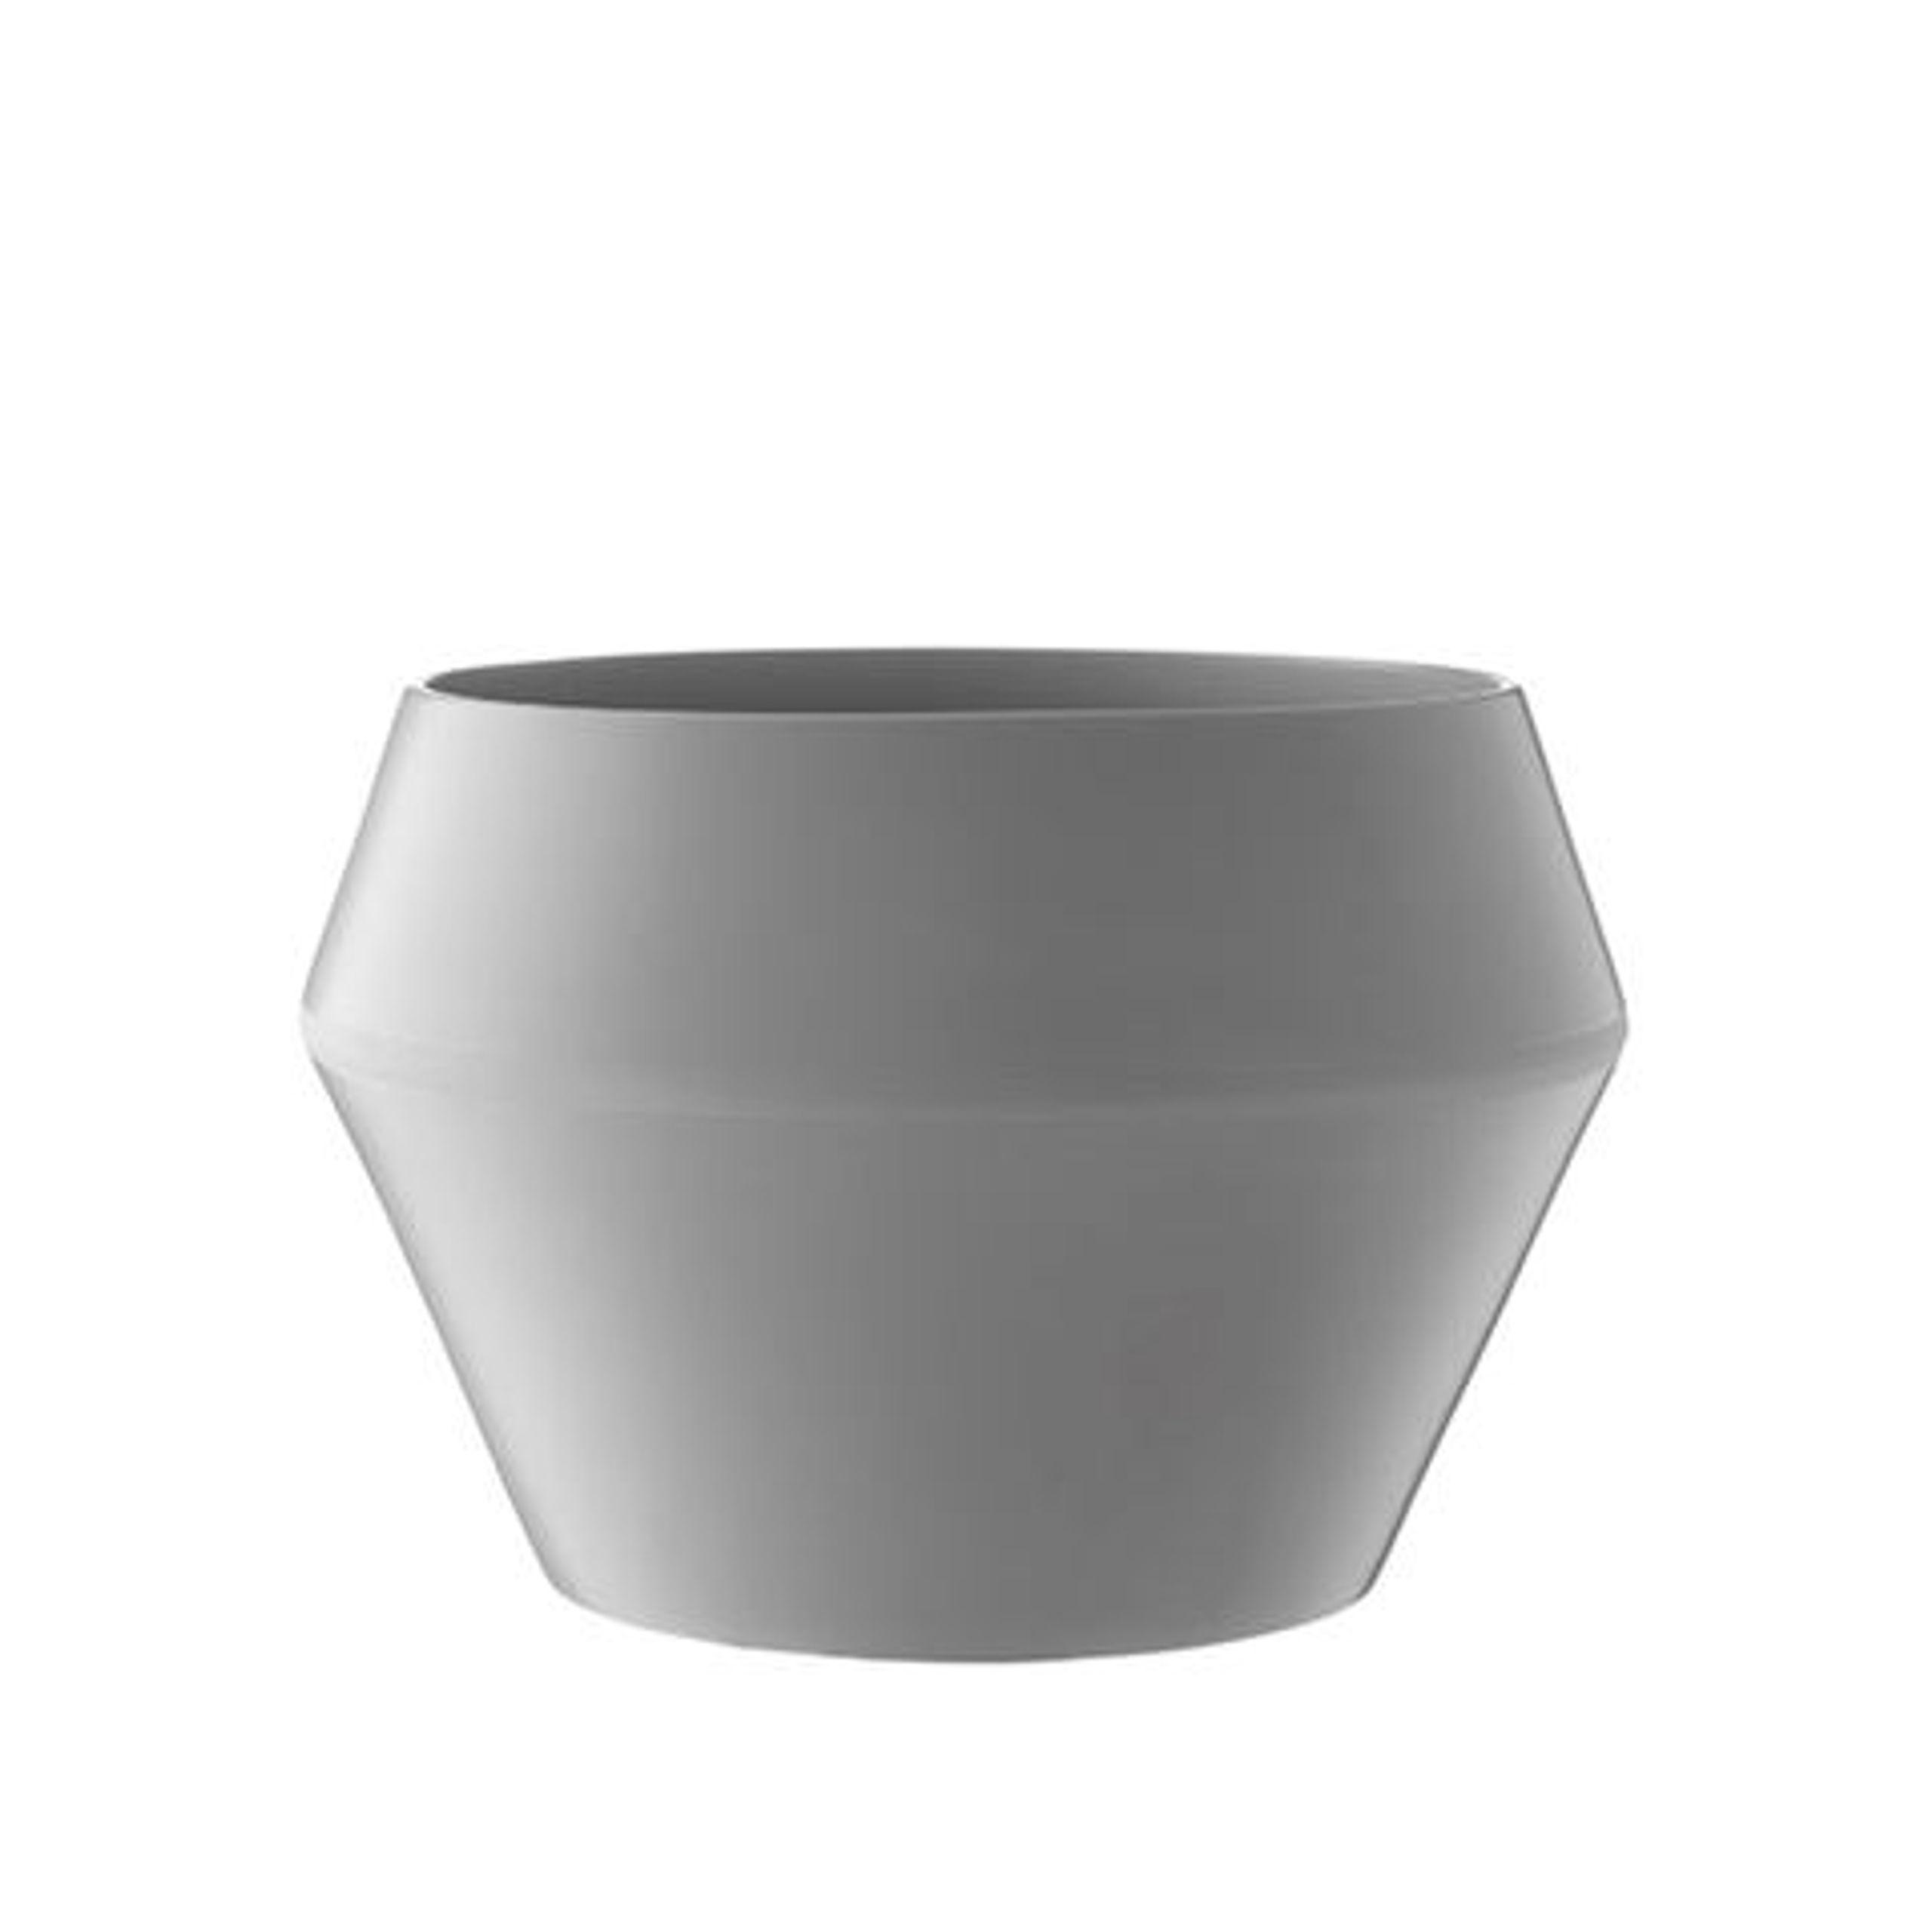 rimm flowerpot flowerpot by lassen. Black Bedroom Furniture Sets. Home Design Ideas